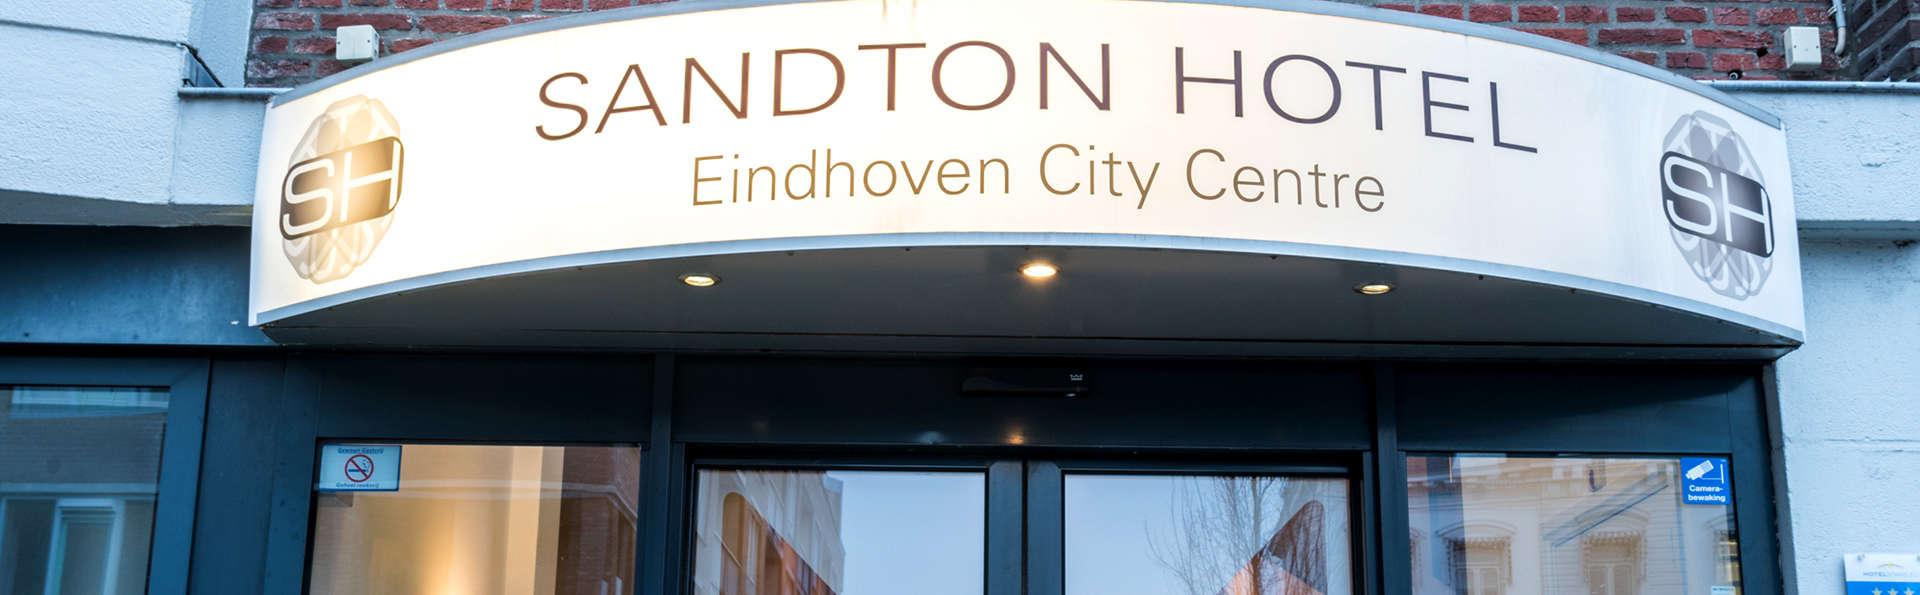 Sandton Hotel Eindhoven Centre - EDIT_NEW_FRONT.jpg